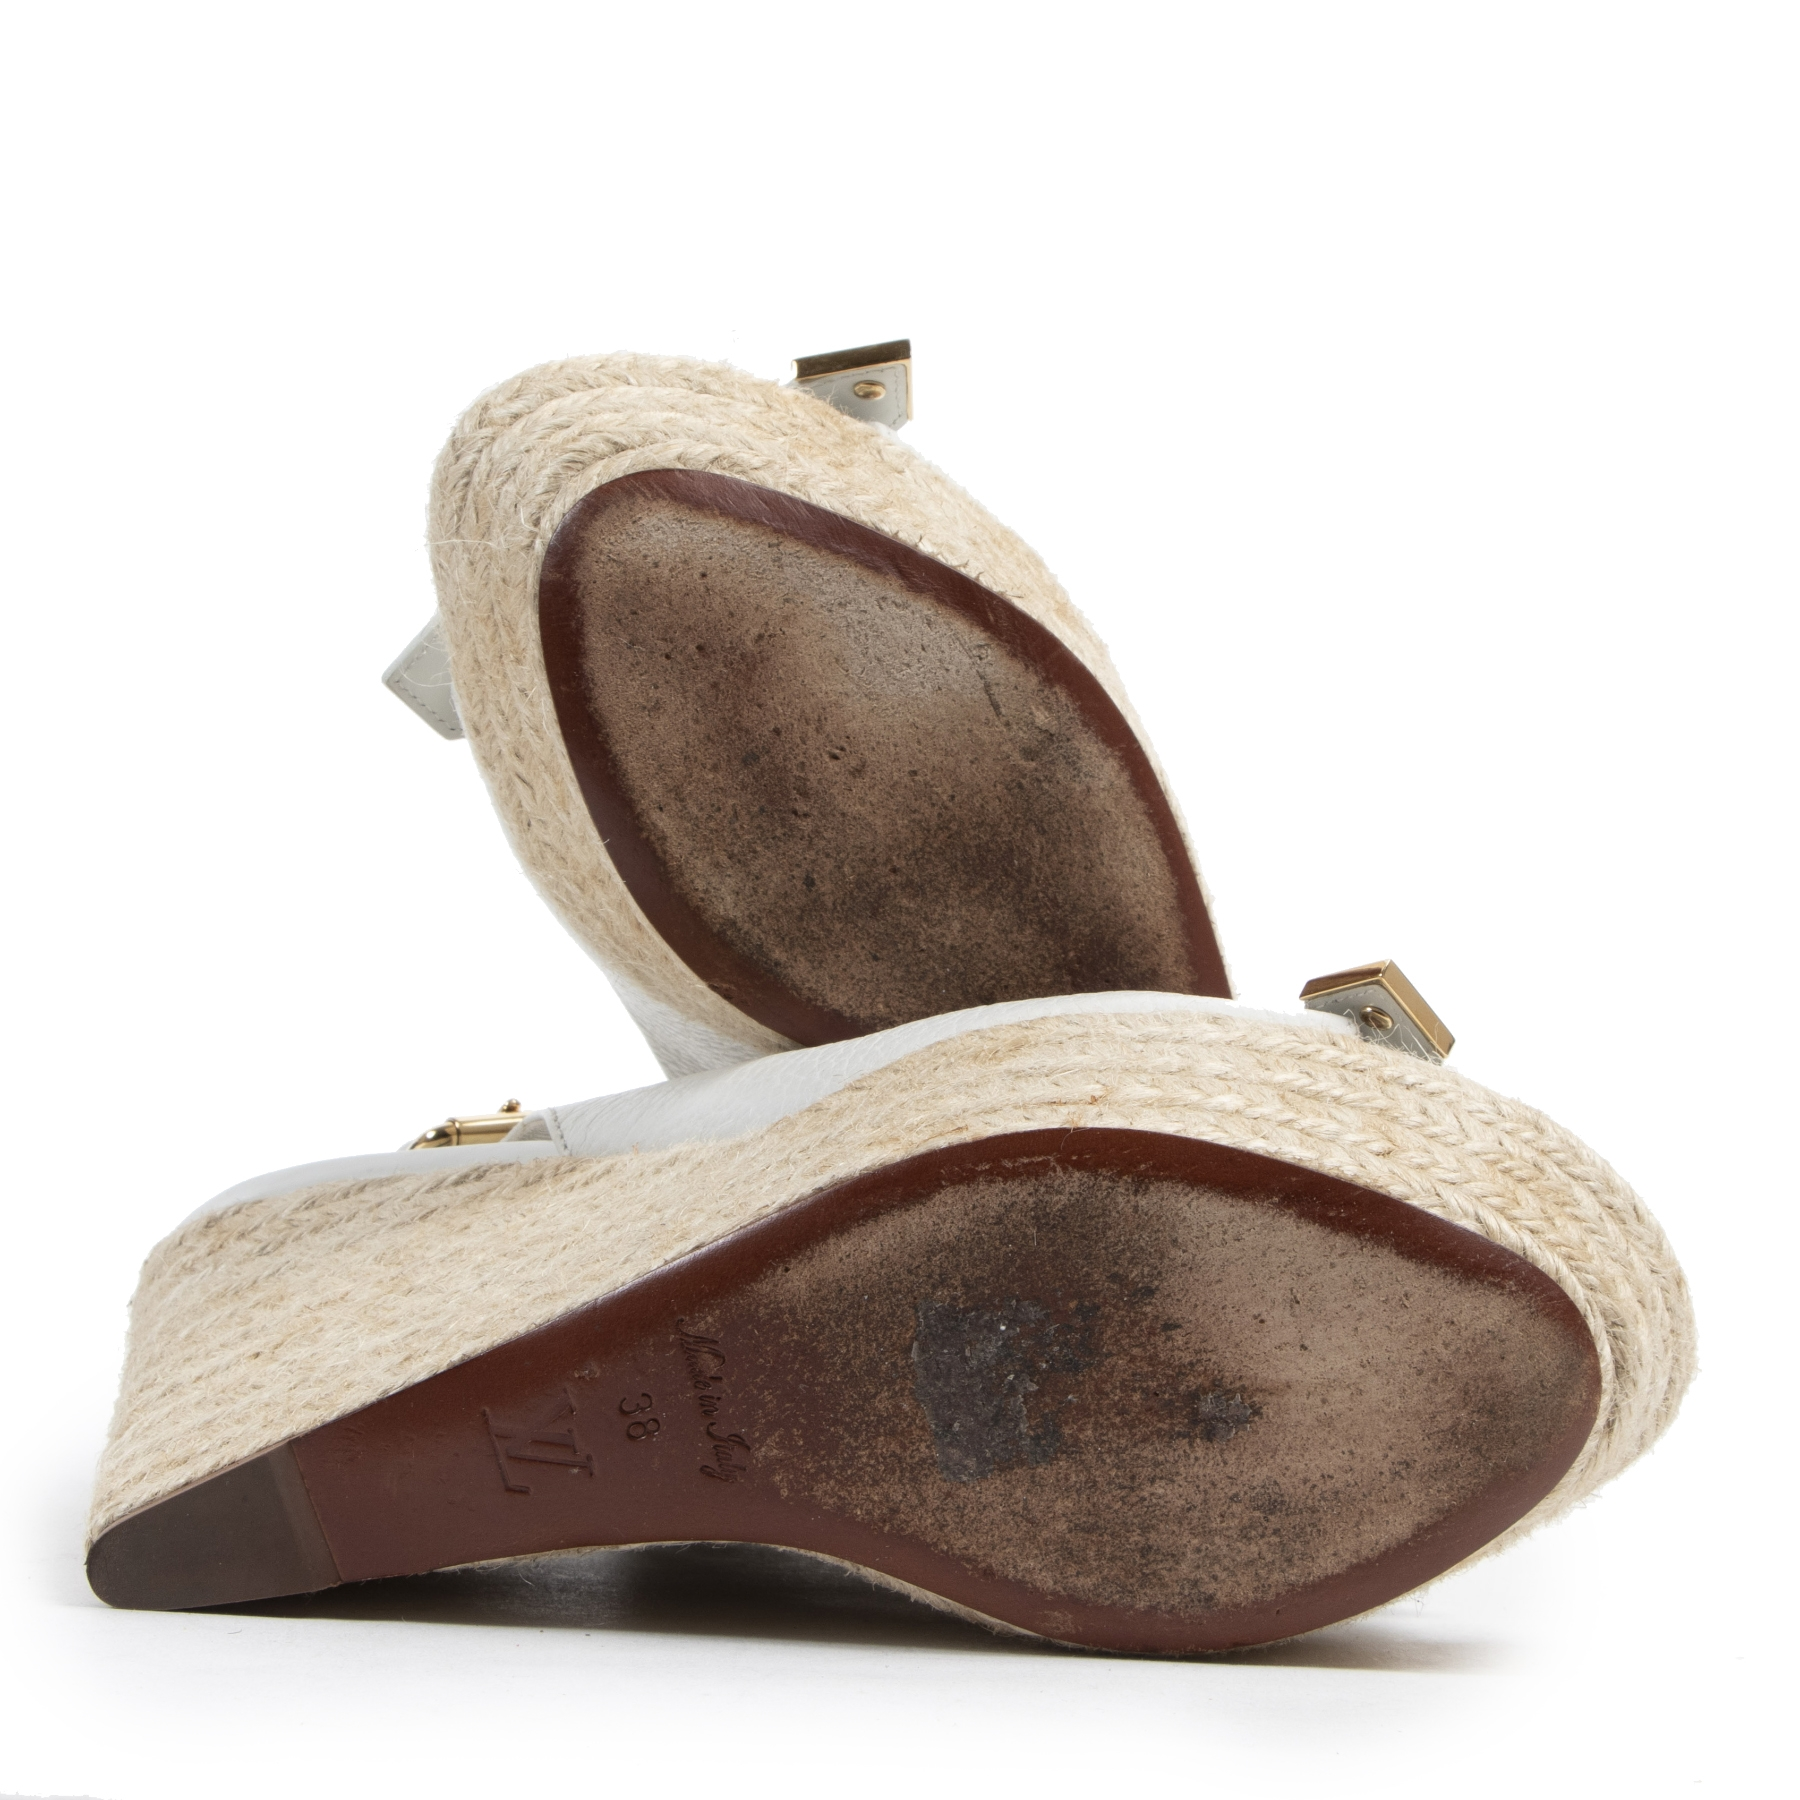 Louis Vuitton Espadrille Wedge Sandals - Size 38